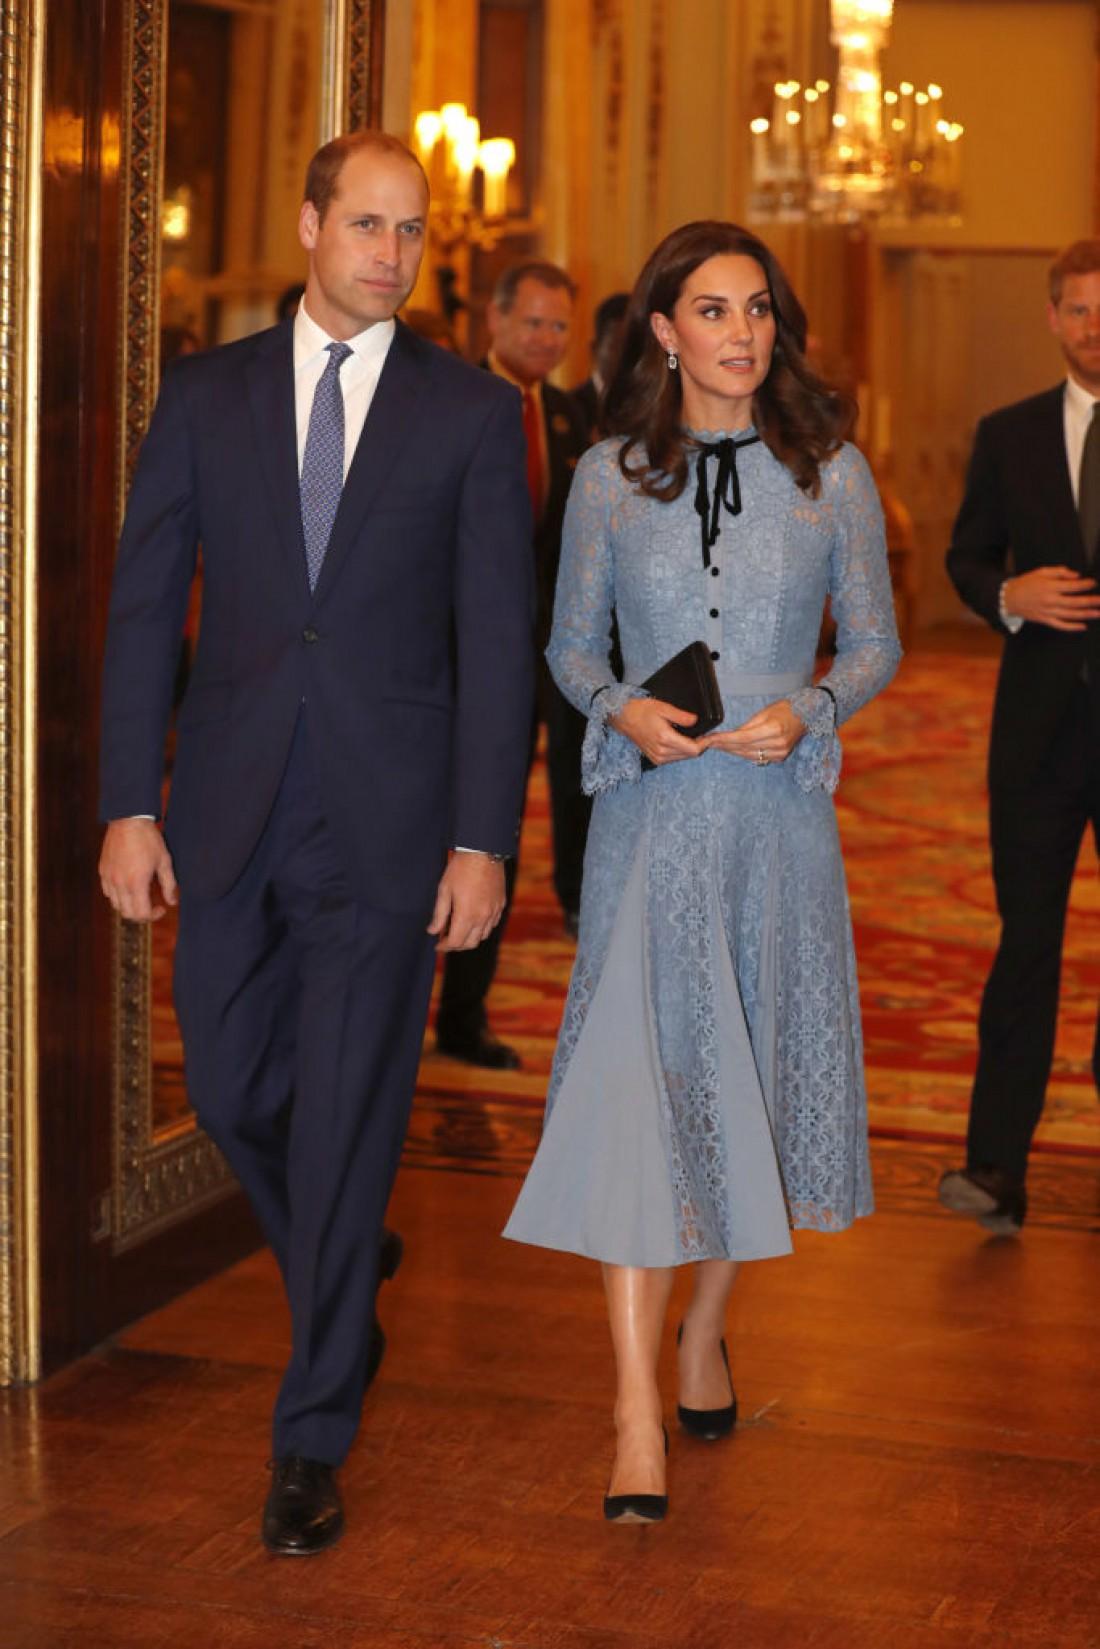 Принц Уильям и Кейт Мидллтон